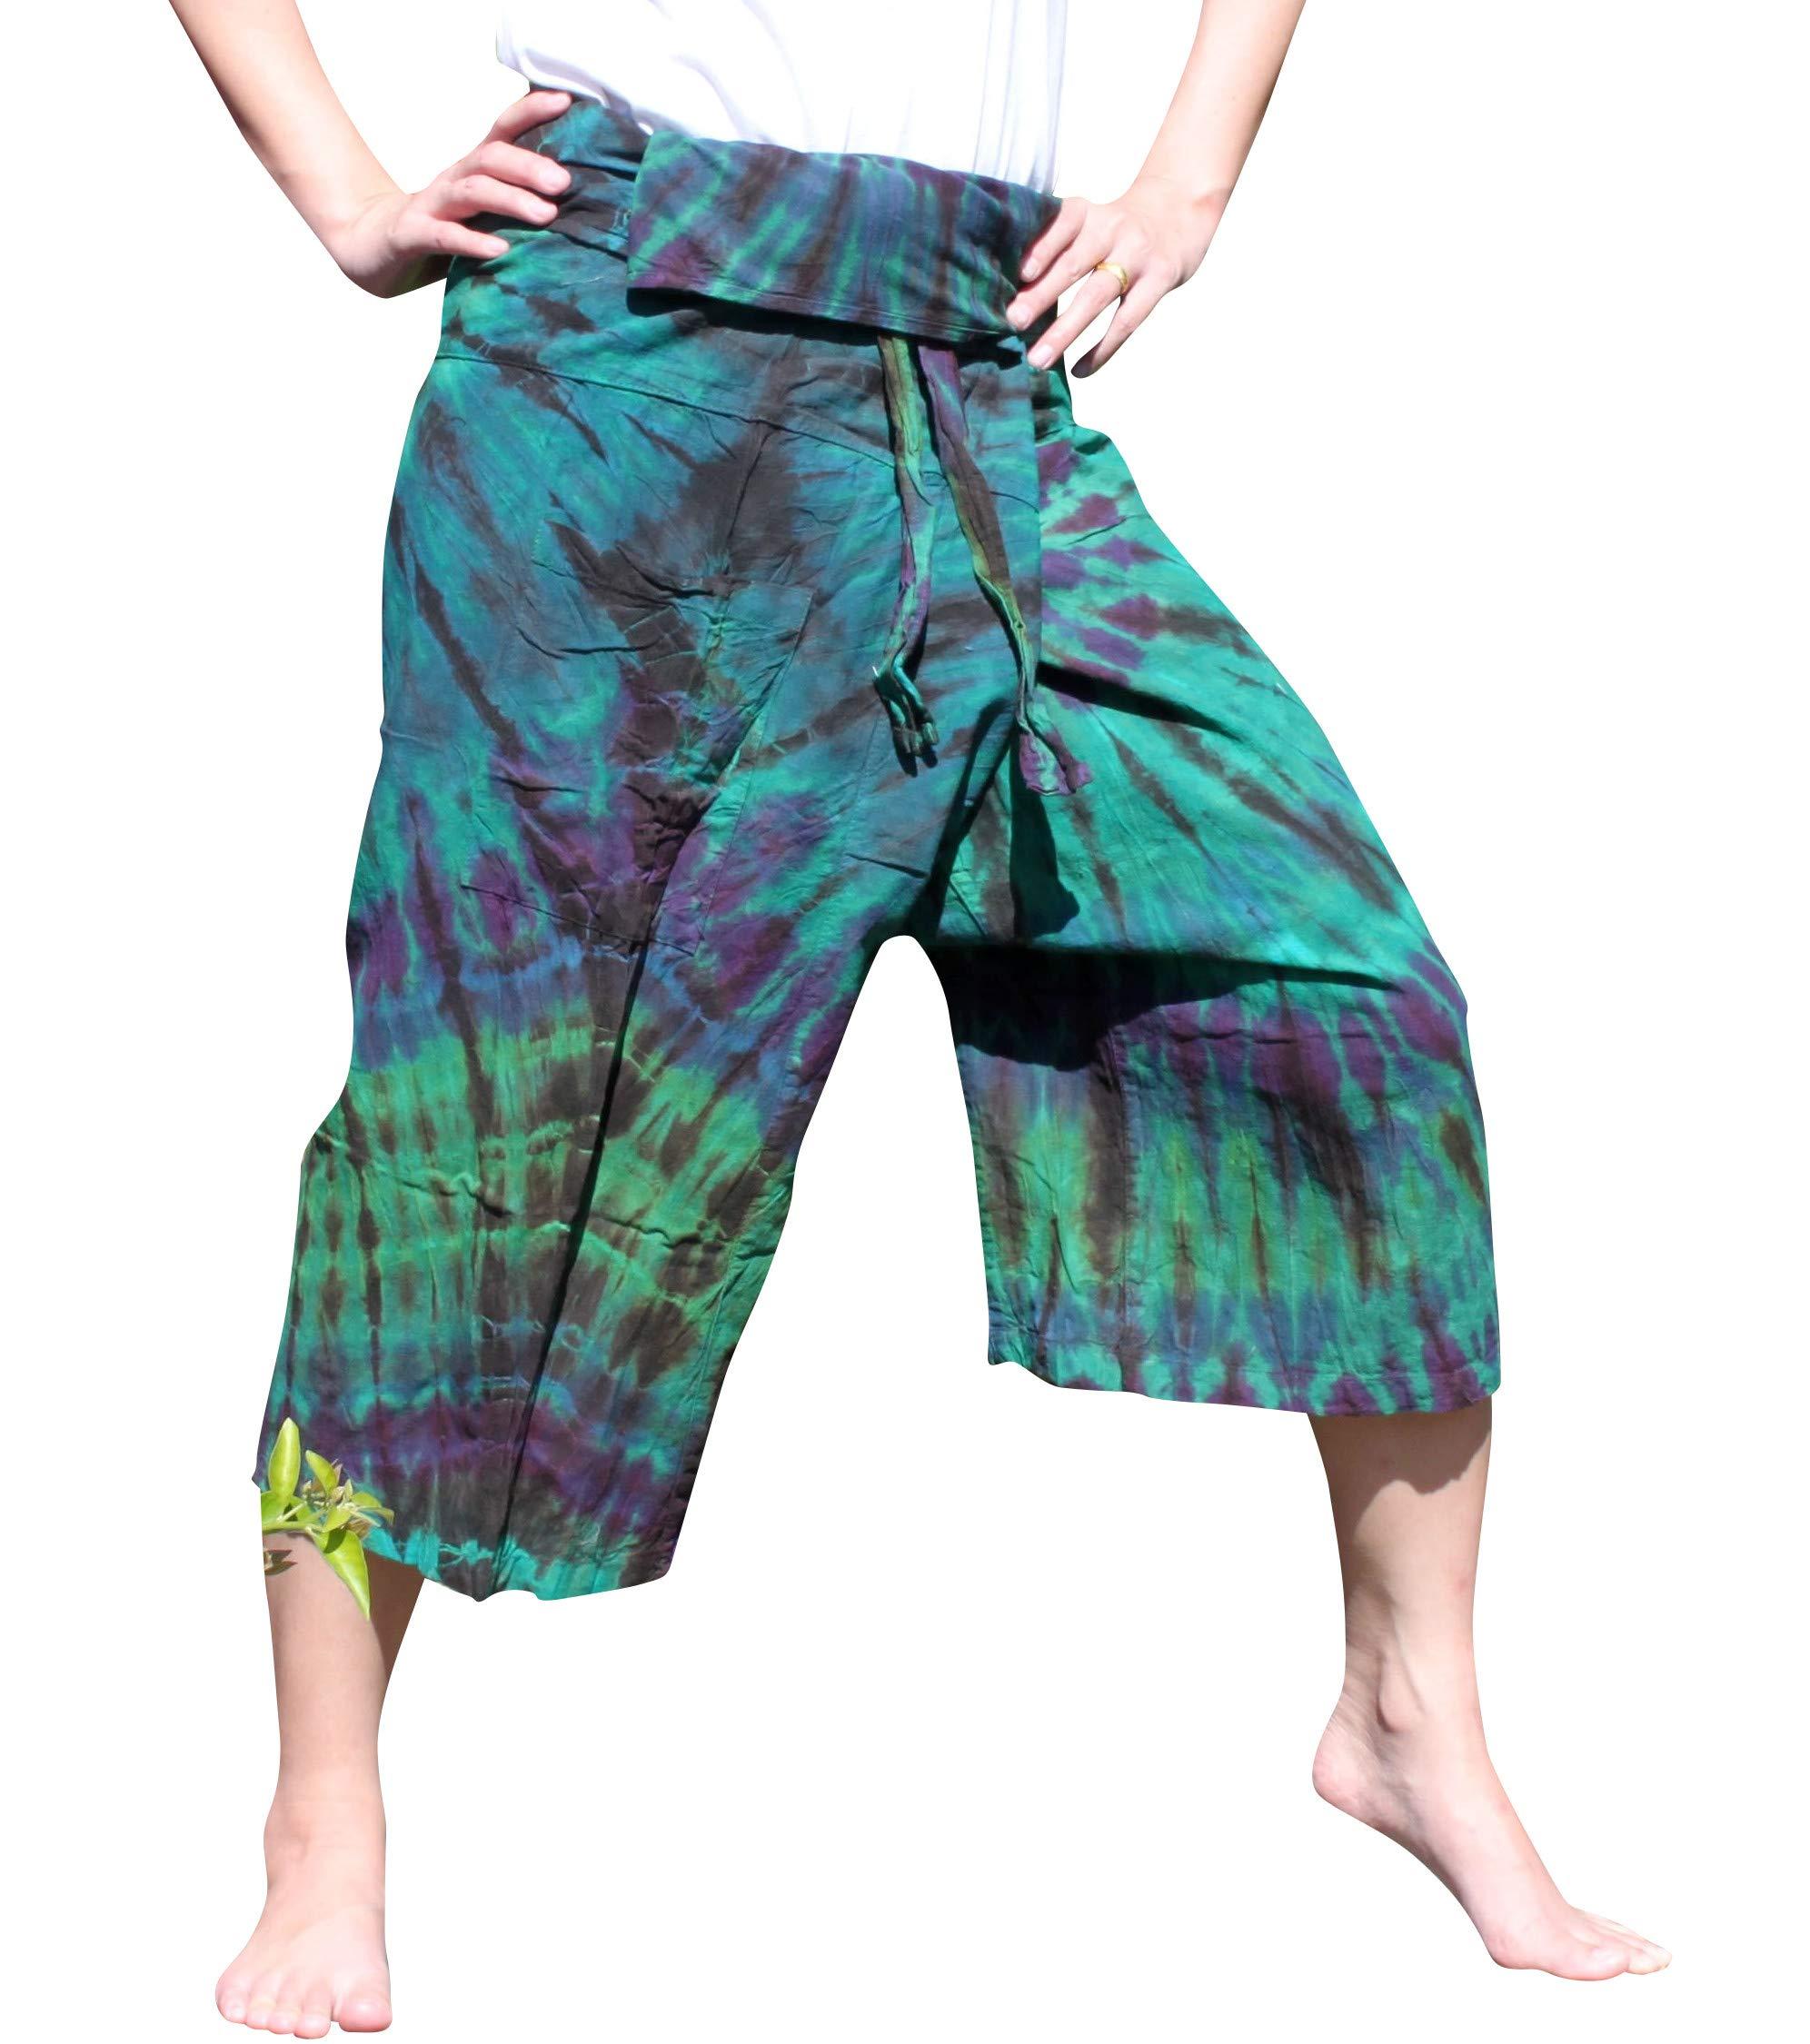 Full Funk Cotton Tie Dyed Natural Colorful Thai Fisherman Wrap 3/4 Leg Pants, Medium, Bottle Green by Full Funk